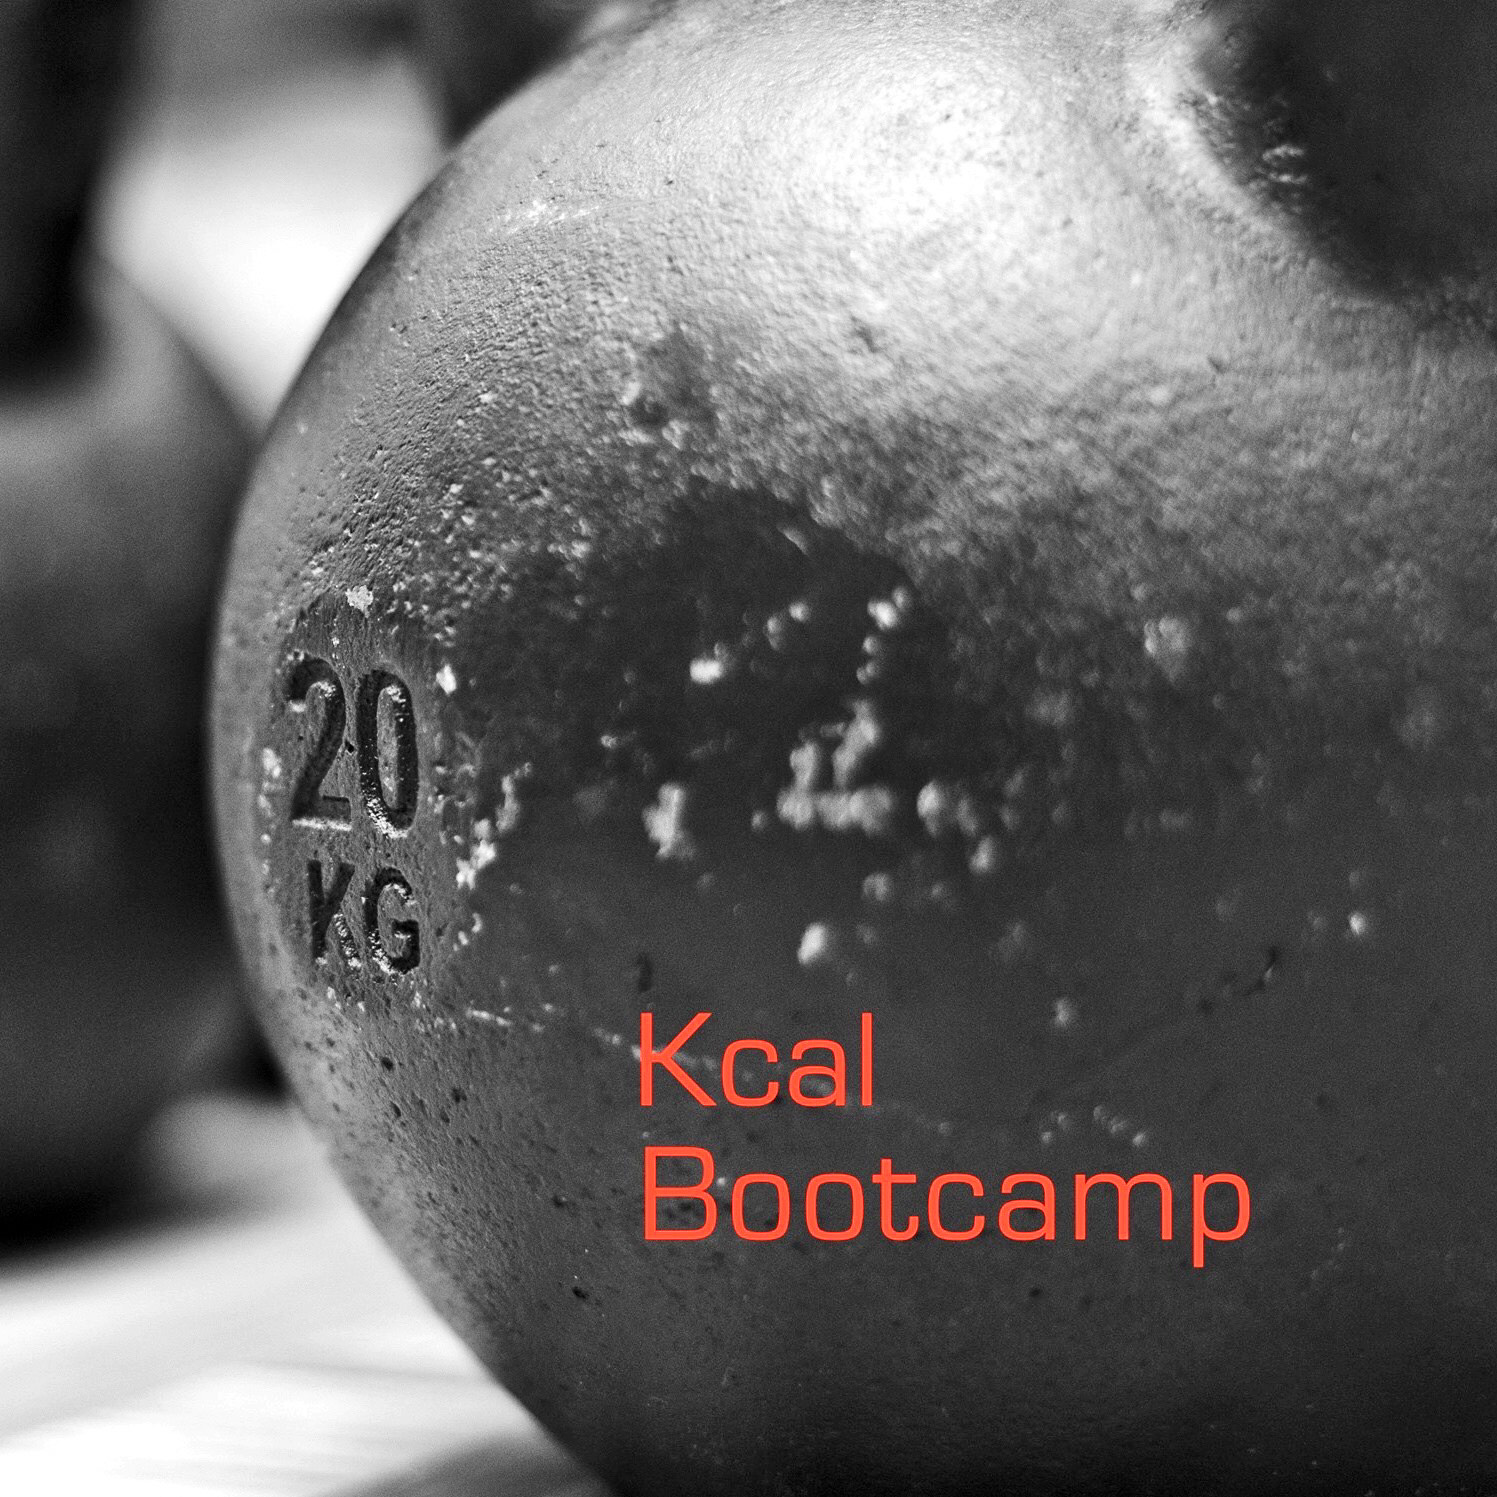 Kcal Bootcamp